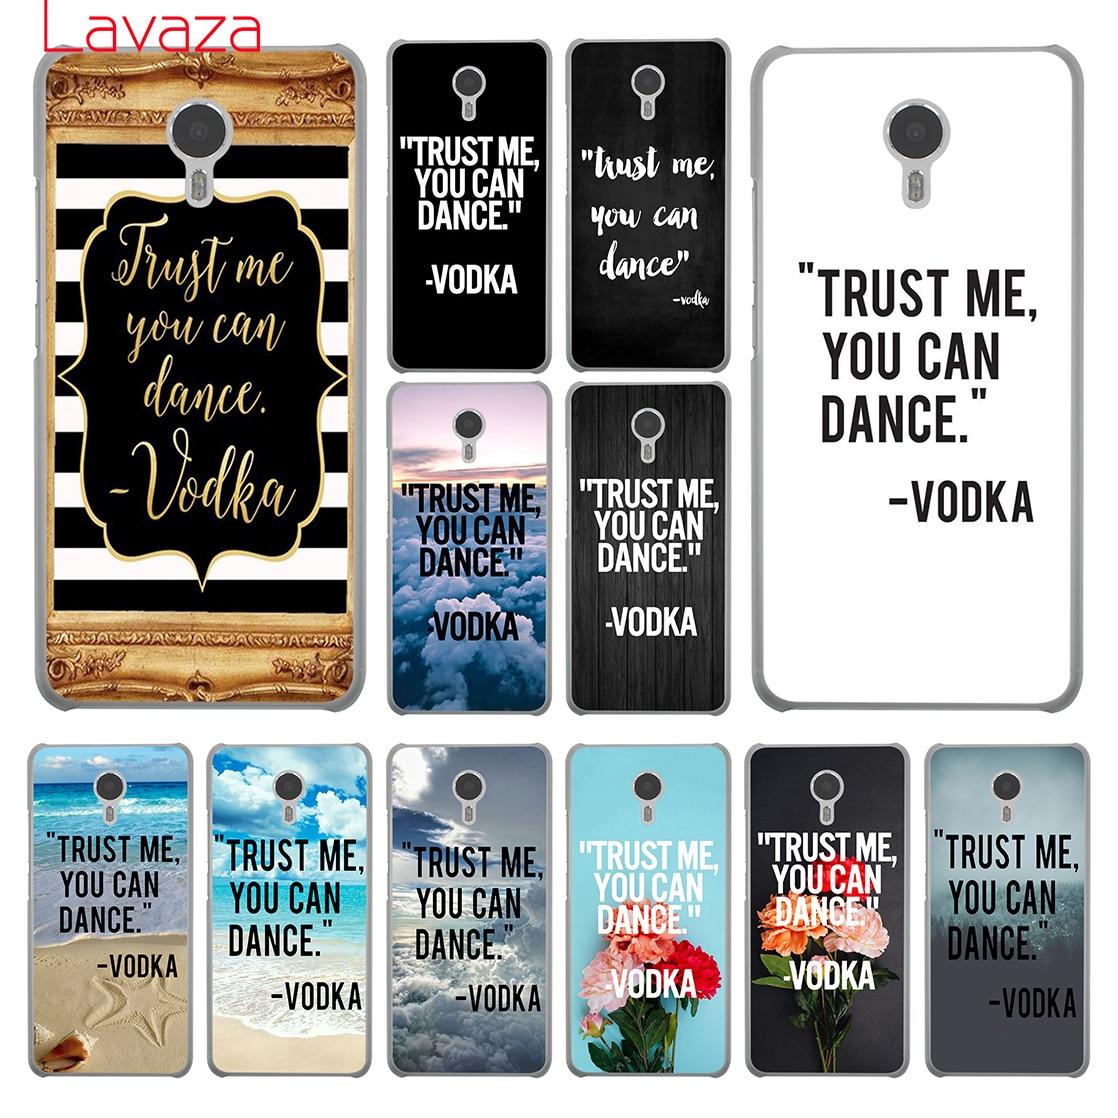 Lavaza поверьте мне вы можете танцевать vodka Жесткий телефон чехол для Meizu M6 M5 M5C M5S M3 M3S M2 Примечание mini Pro 7 плюс 6 U10 U20 крышка